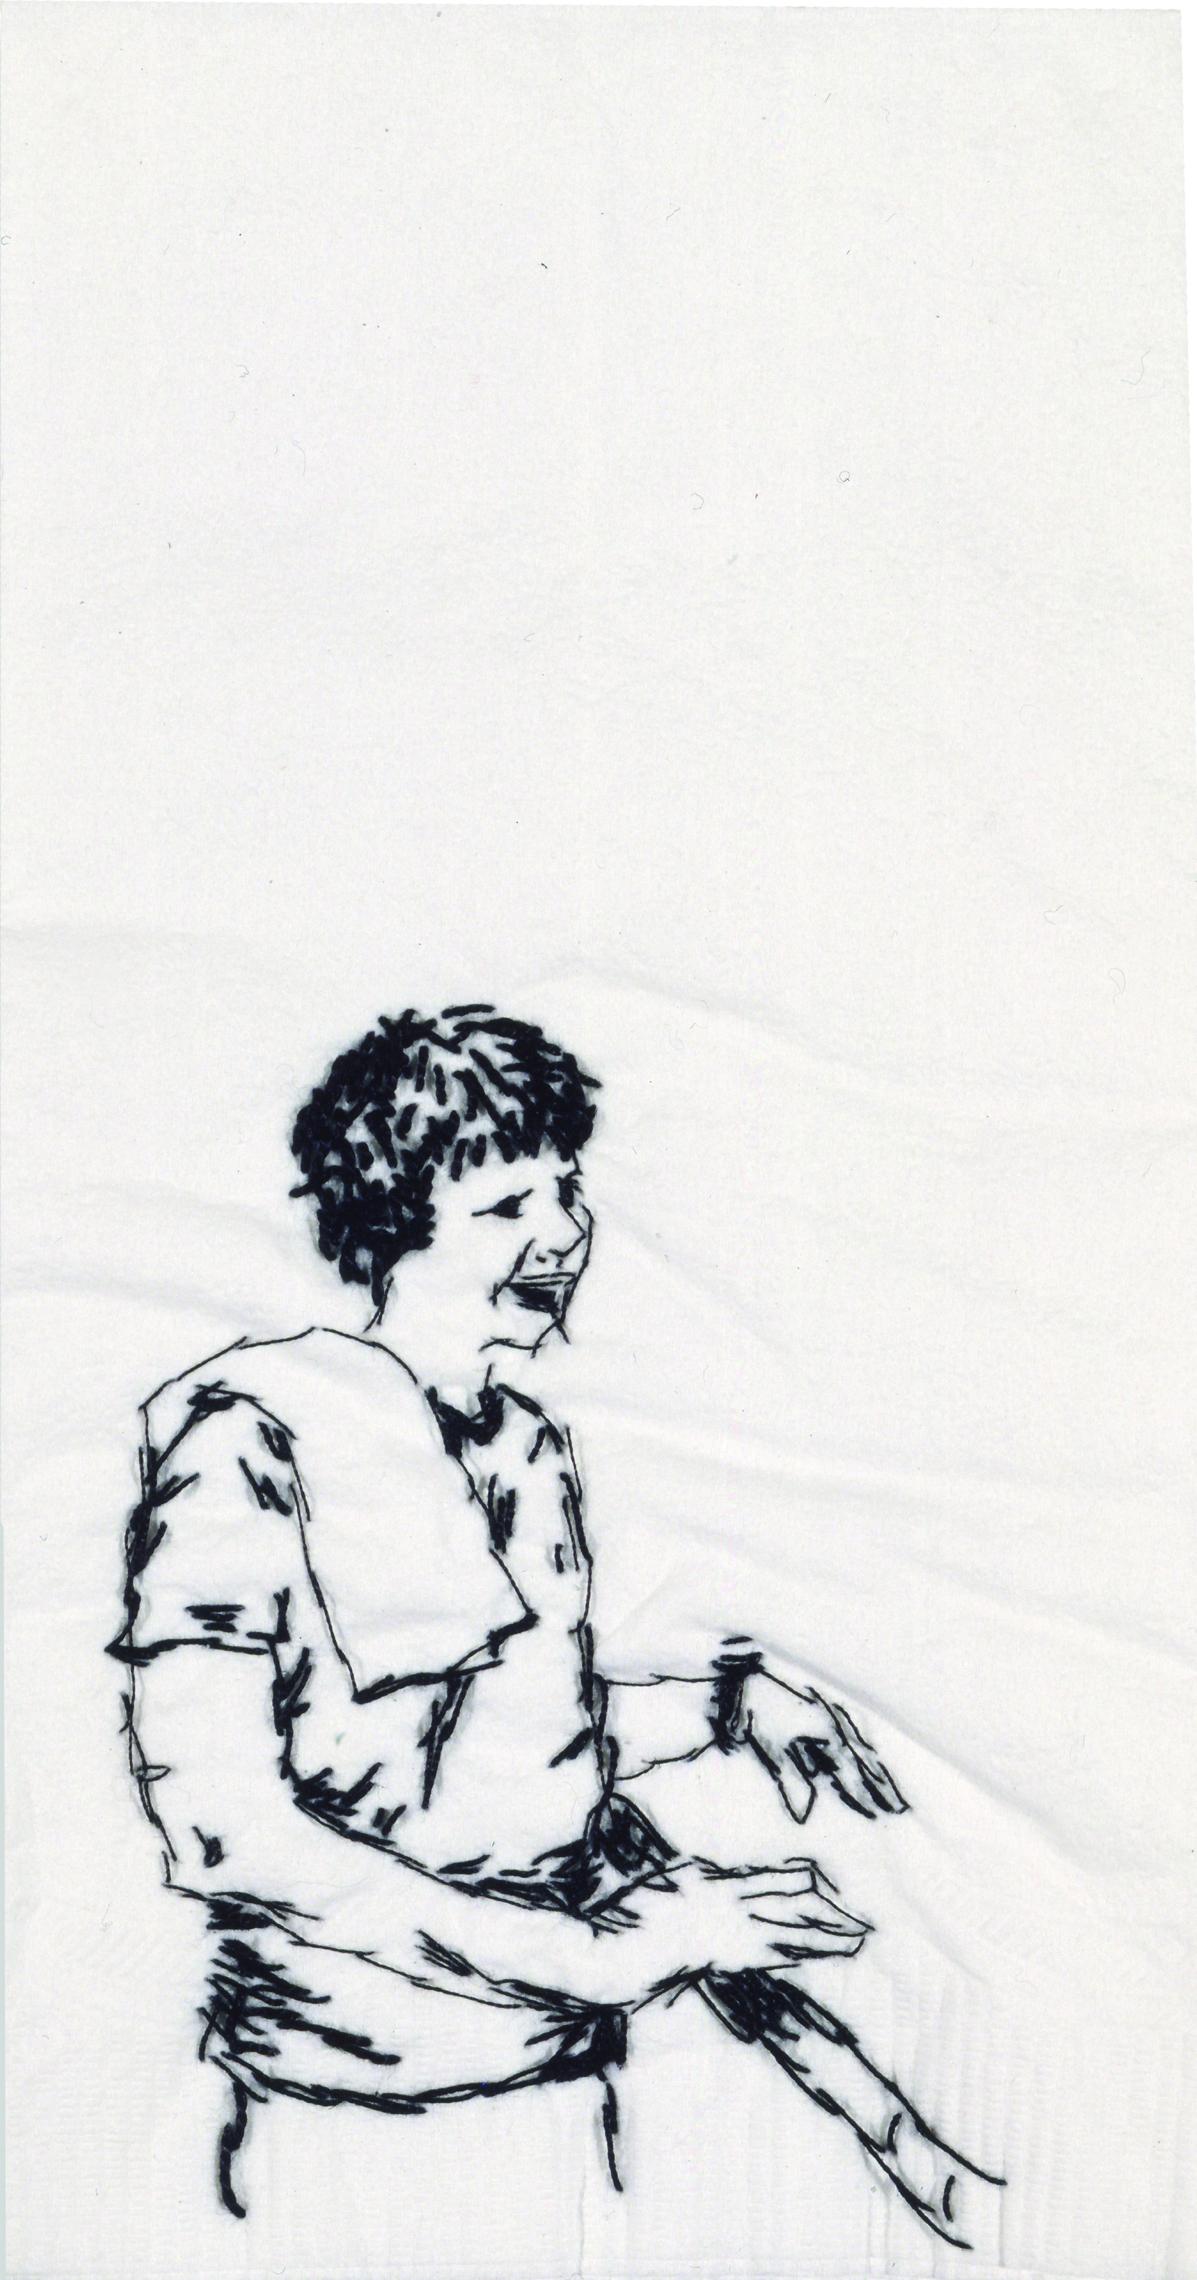 "Molly  Black thread on paper napkin, 7"" x 4"", 2005"